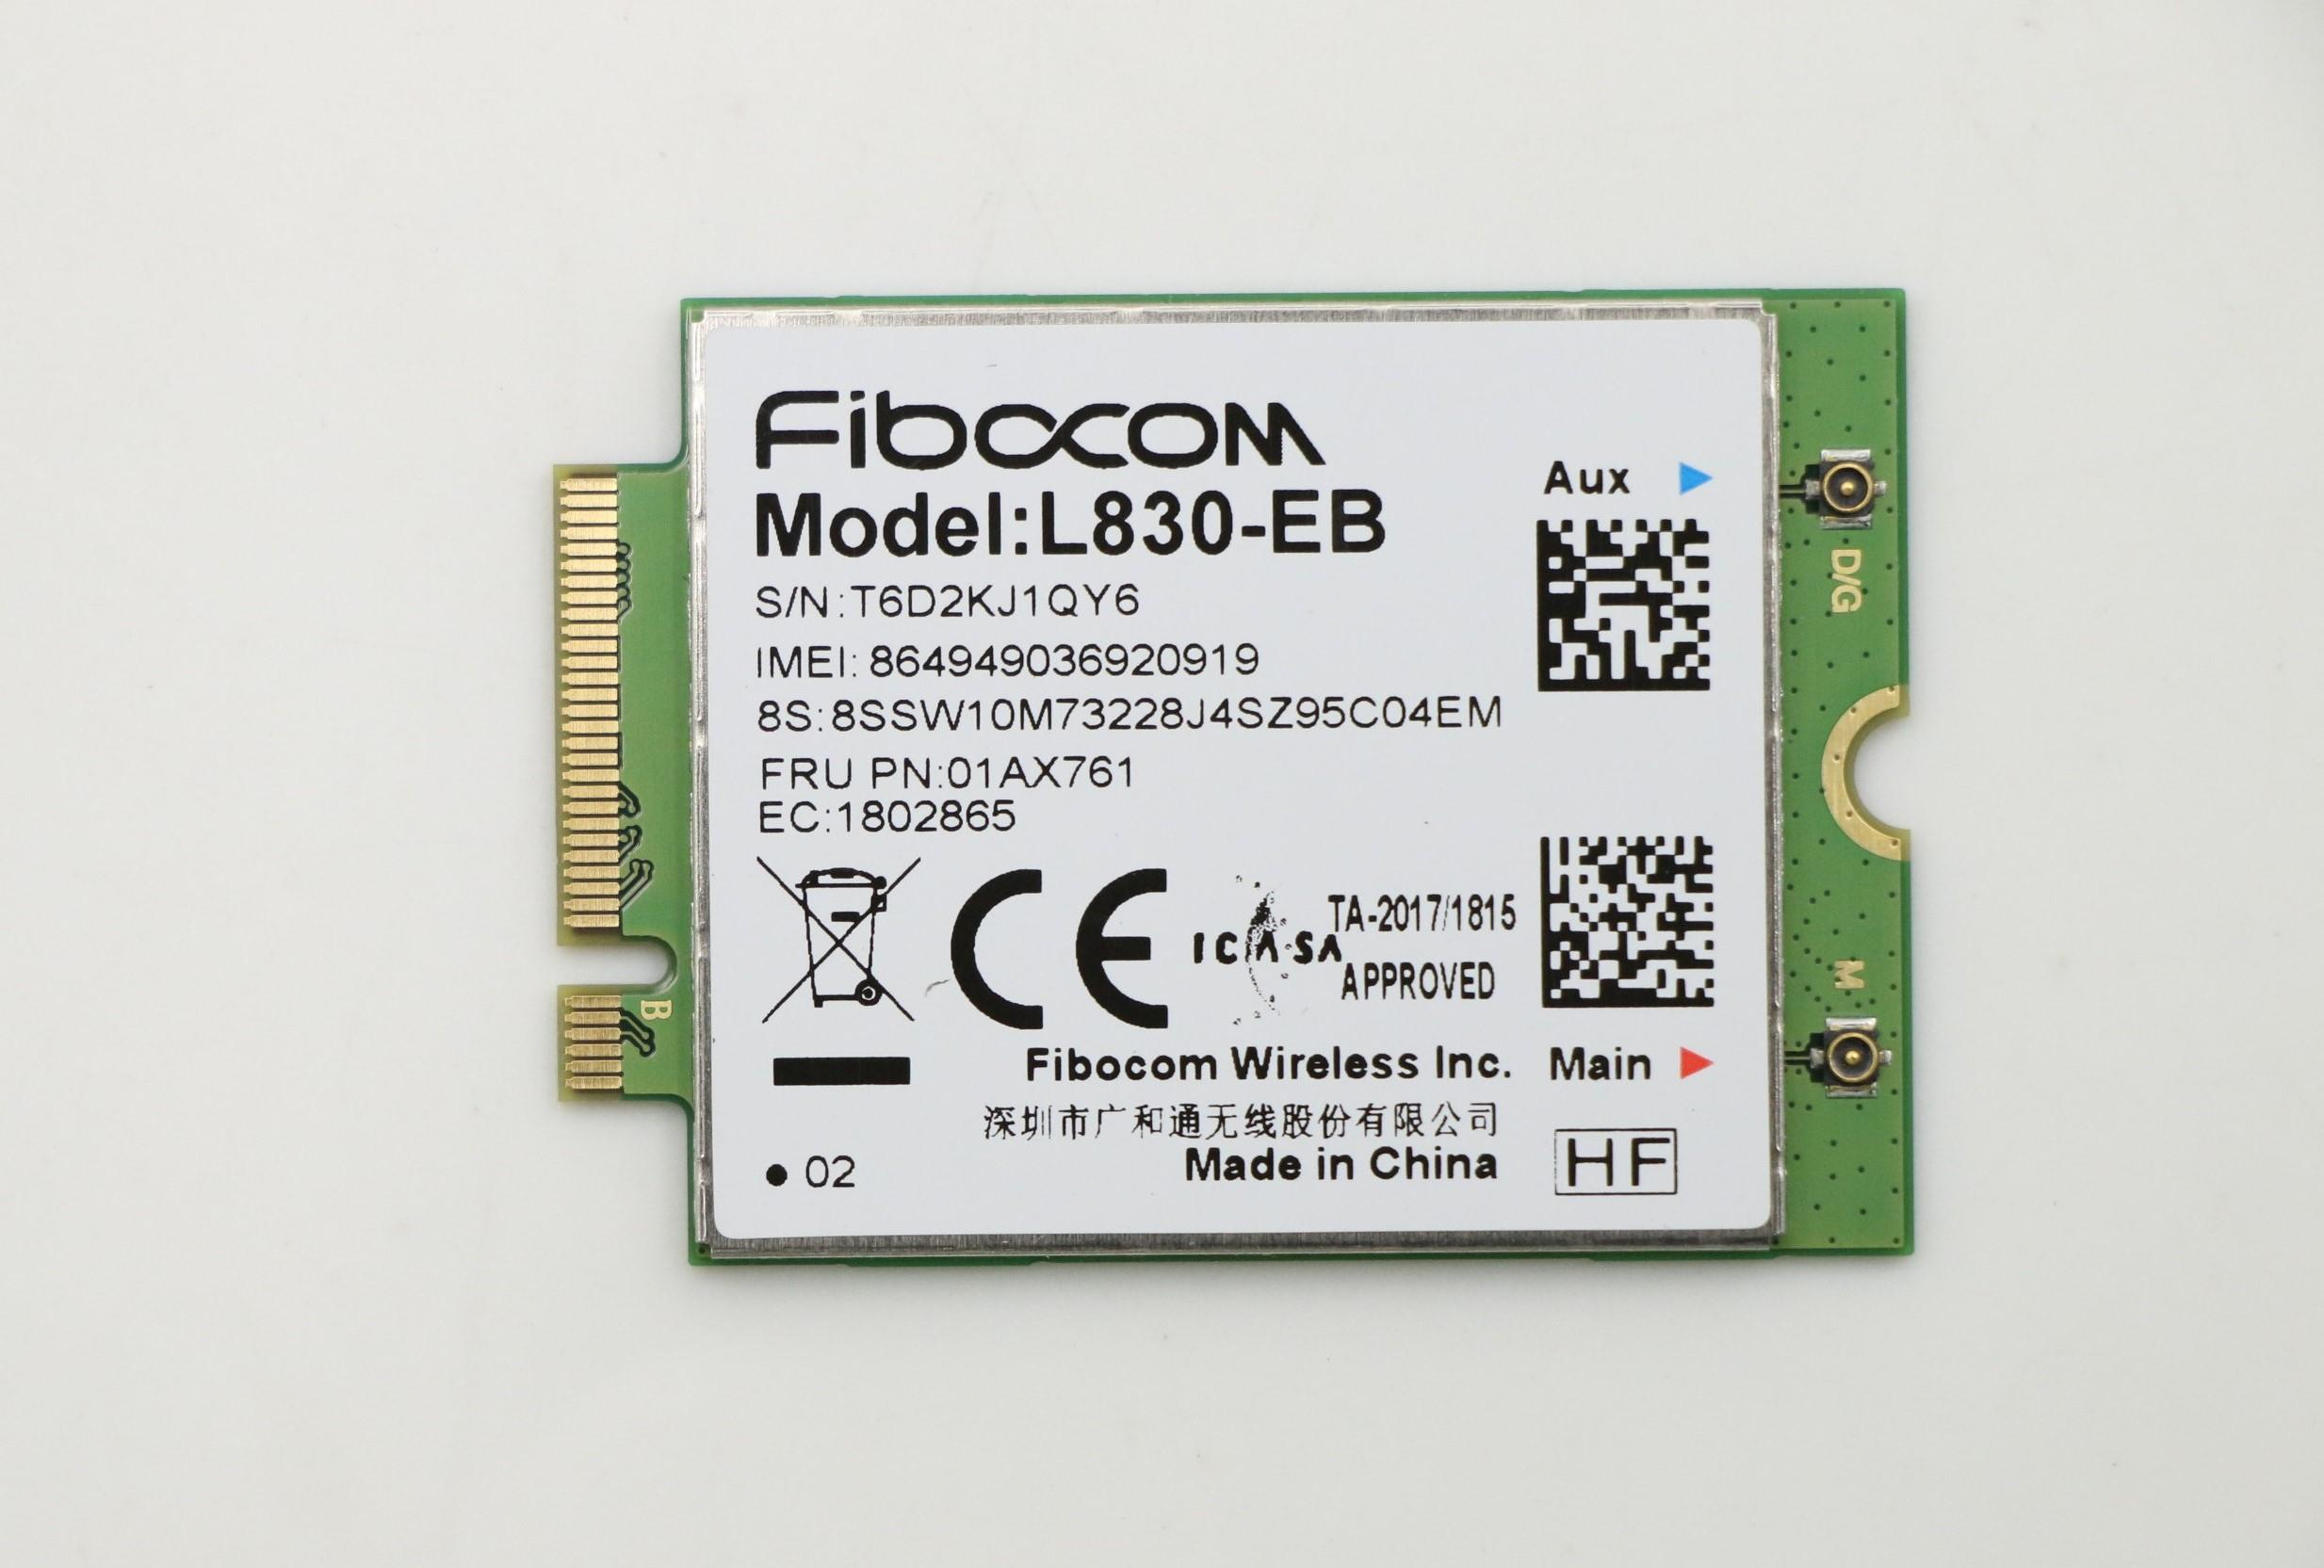 Fibocom L830-EB WWAN Card For Lenovo Thinkpad X280 T480 T480s T580 P52s L480 L580 T490 T590 P53s T490s X390 L490 L590 01AX761